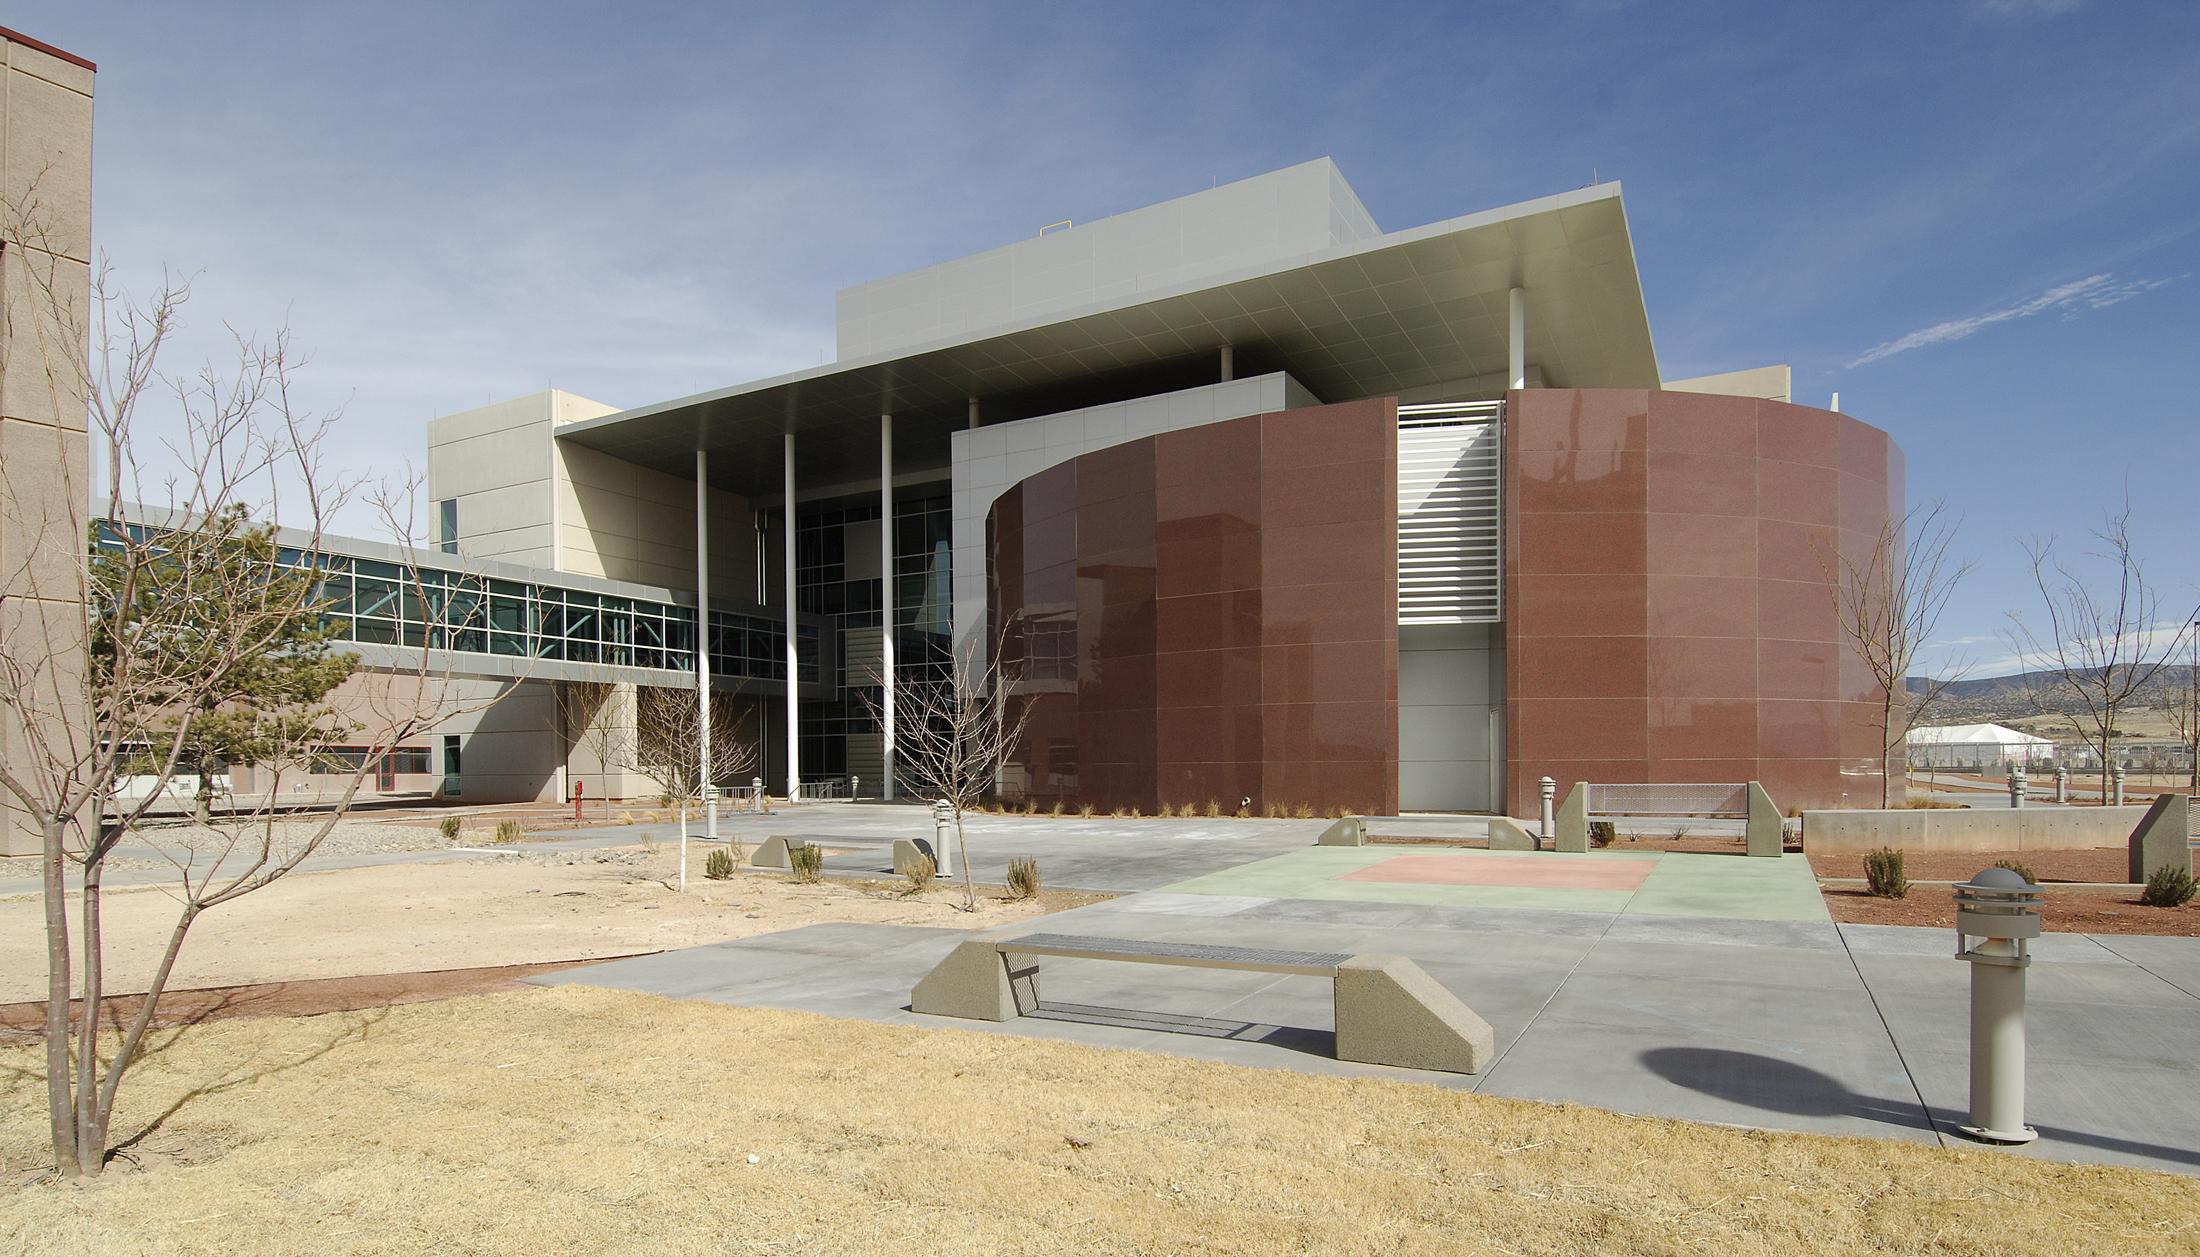 Sandia microfab building gains environmental certification for Certified building designer